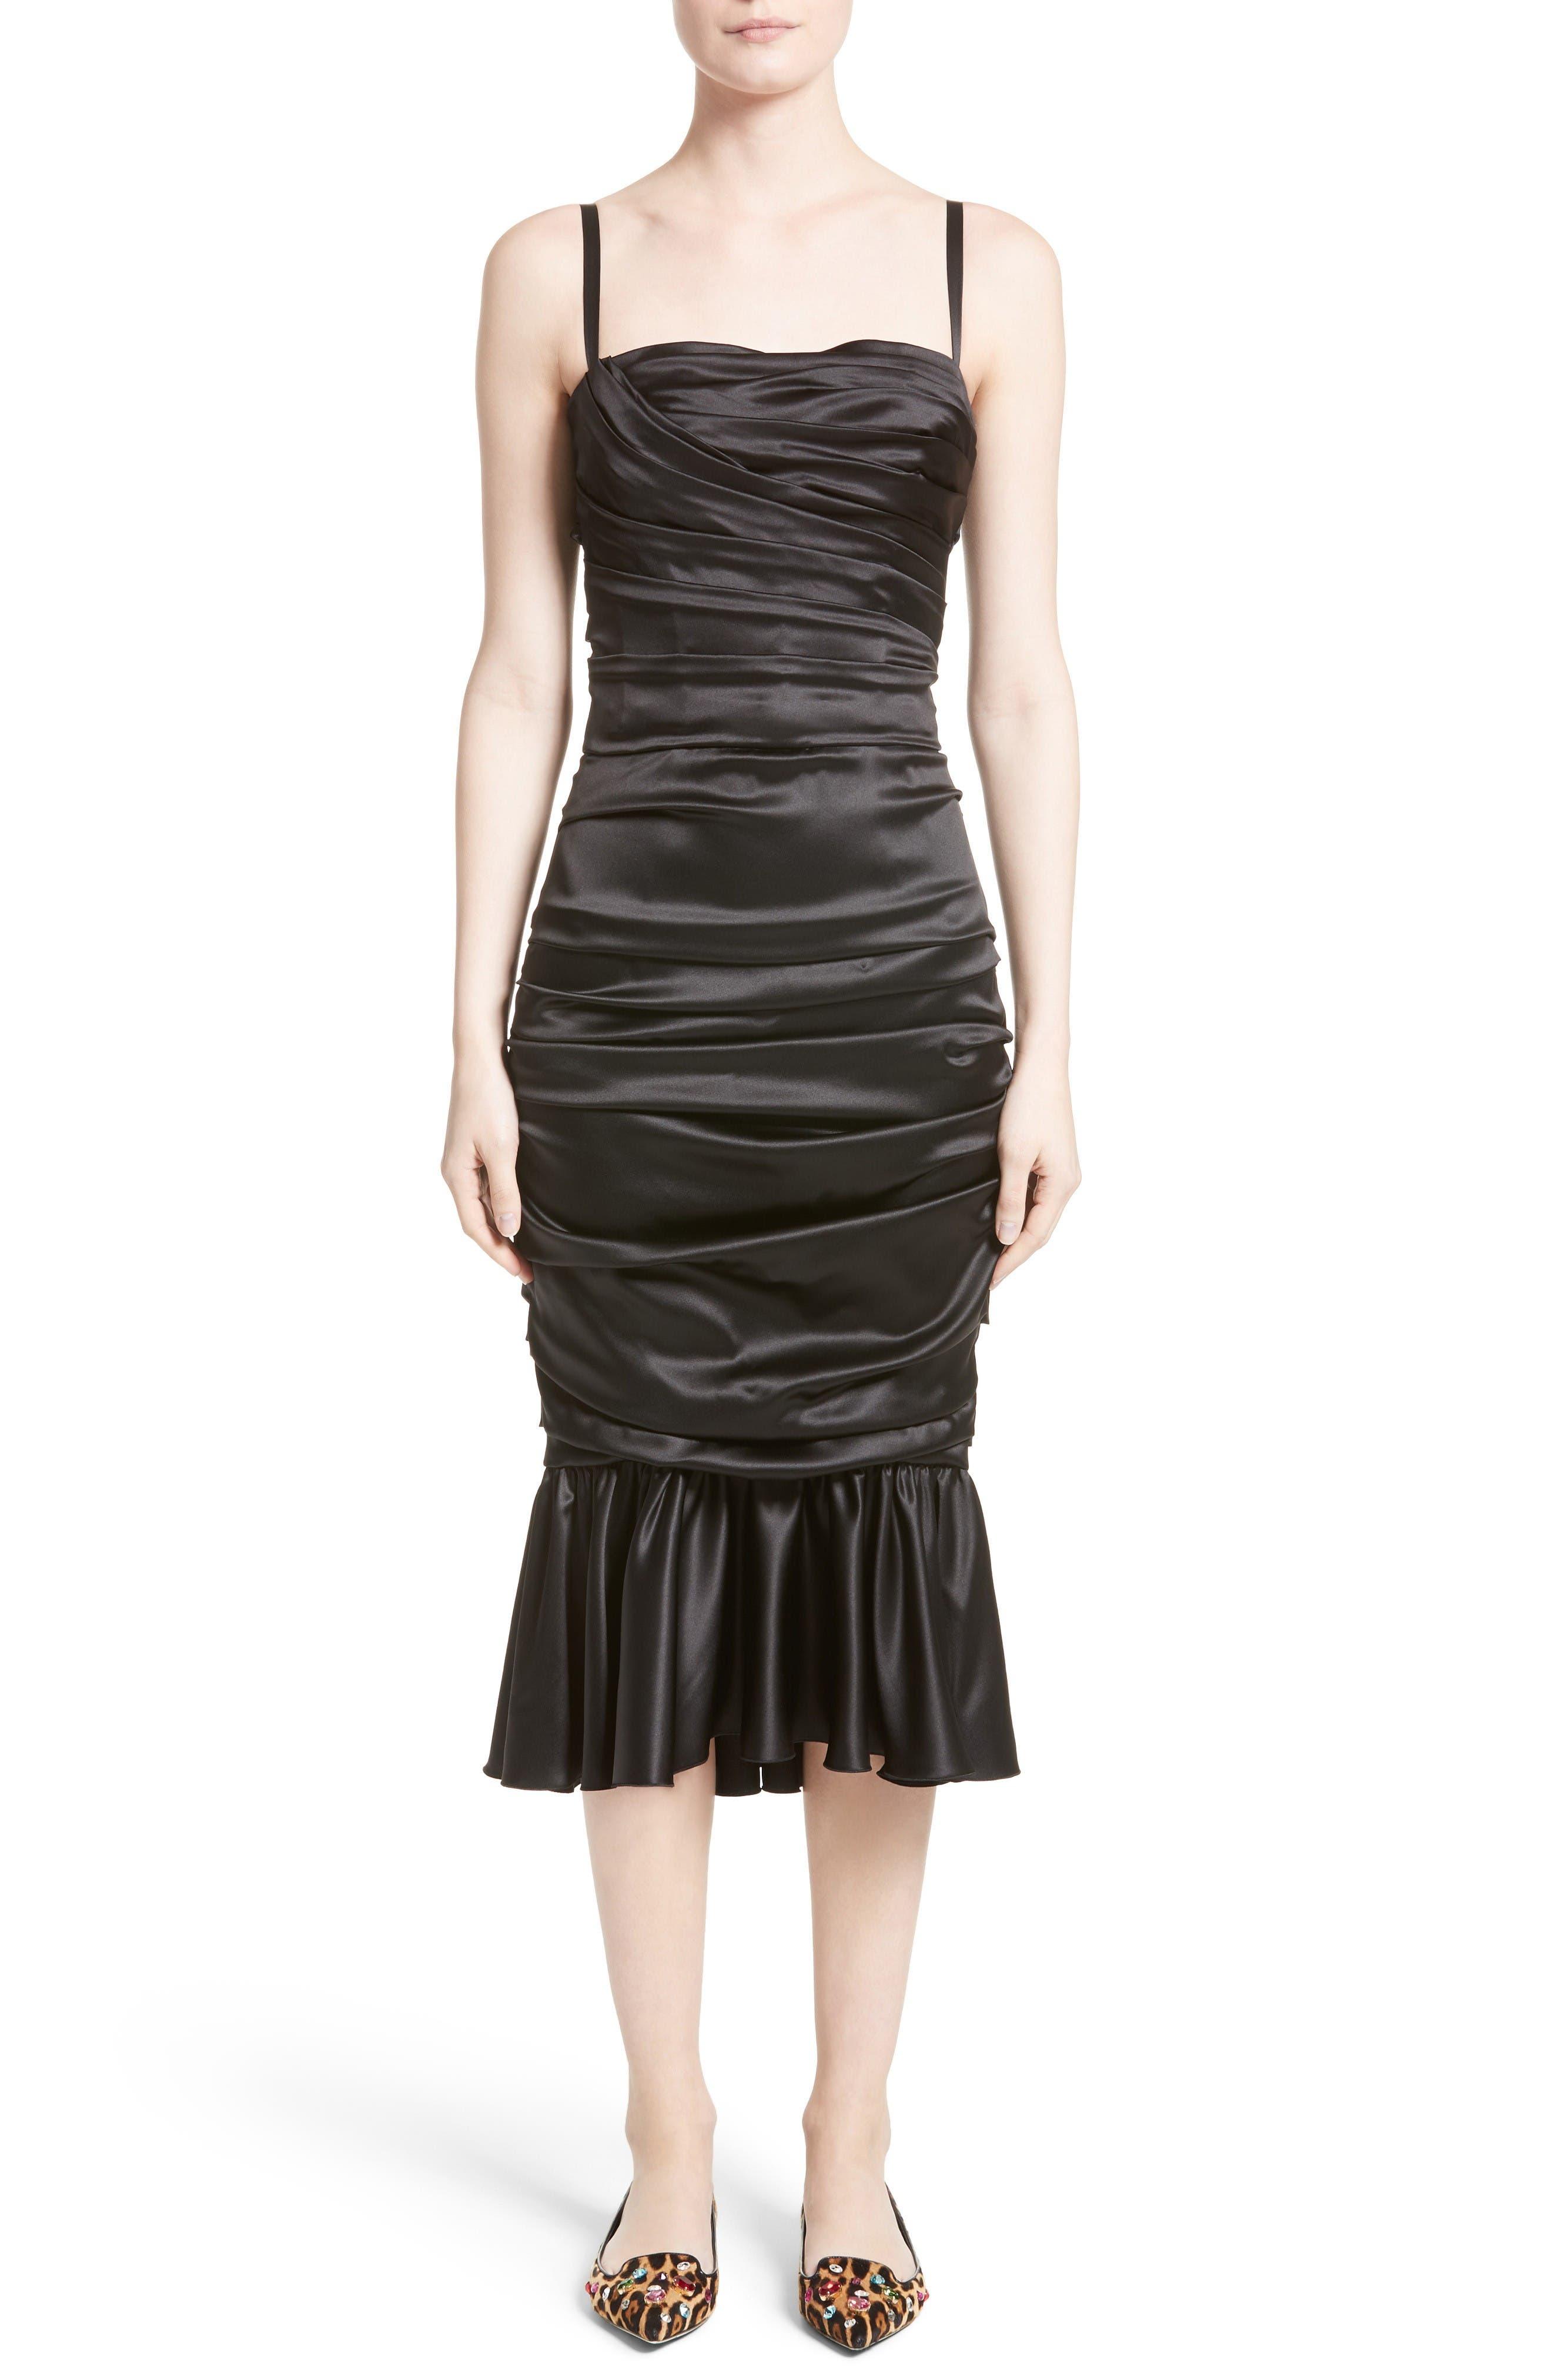 Dolce&Gabbana Ruched Stretch Satin Dress